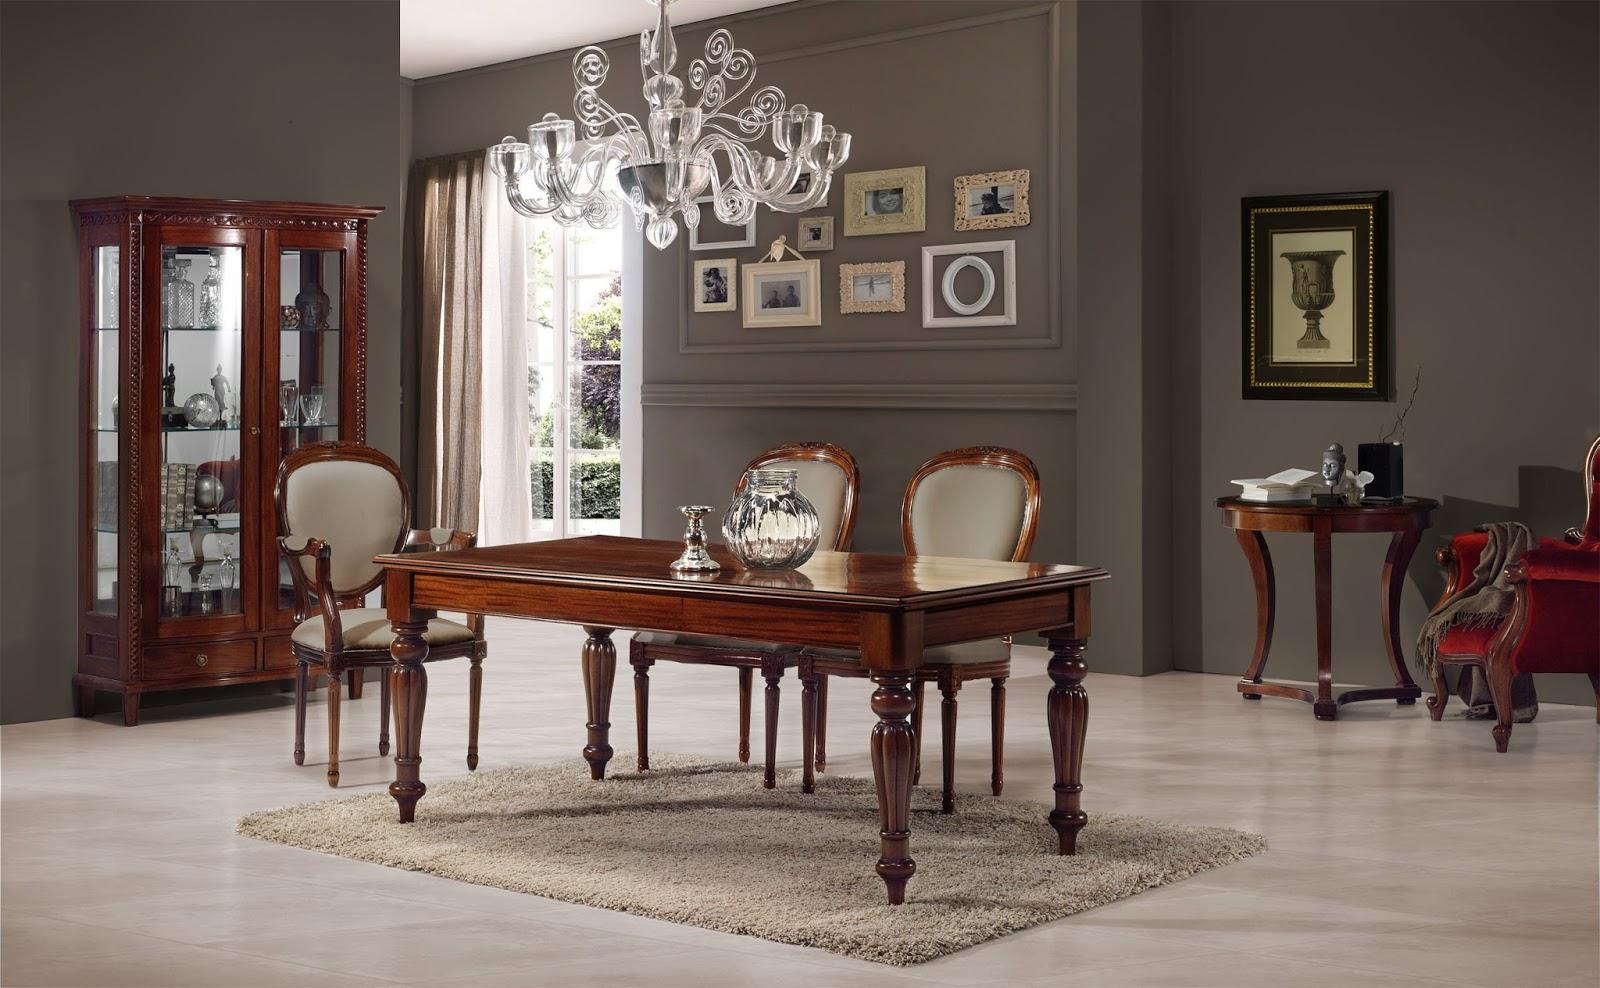 Muebles de comedor comedores clasicos ejemplo de elegancia for Comedores oscuros